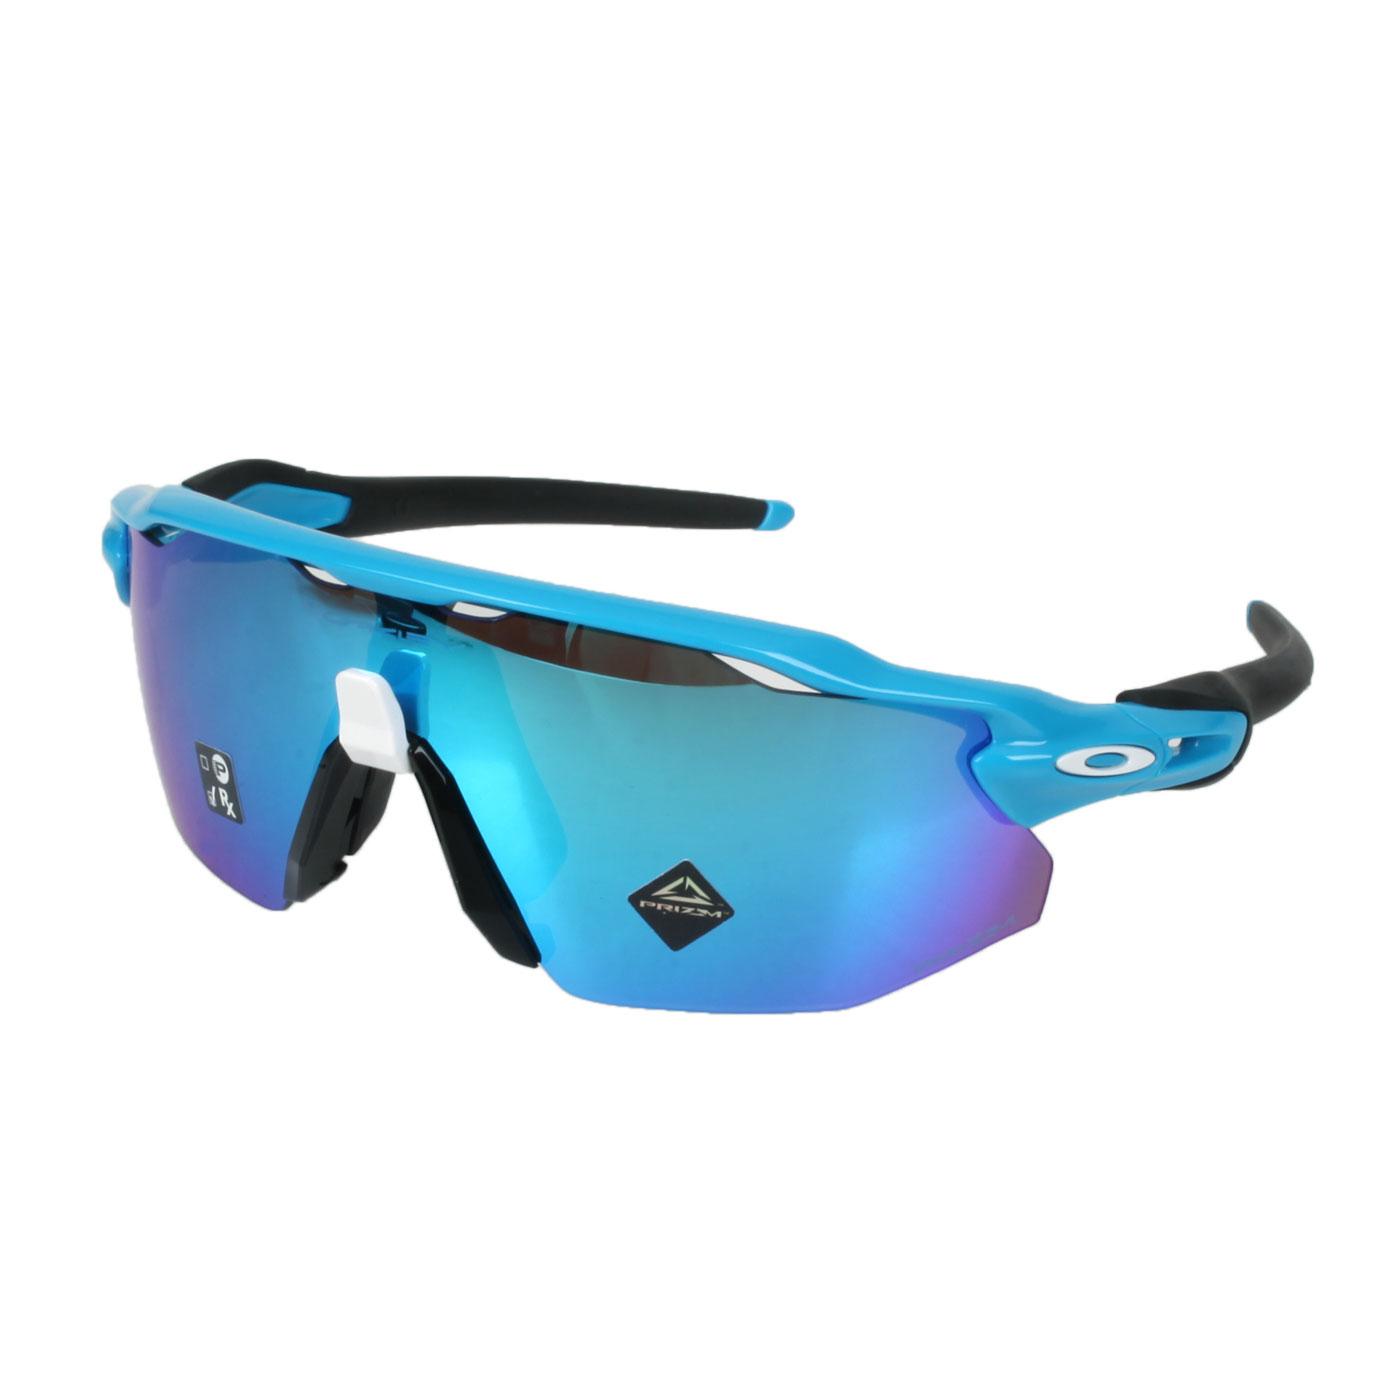 OAKLEY RADAR EV ADVANCER一般太陽眼鏡(附硬盒鼻墊) OAK-OO9442-0238